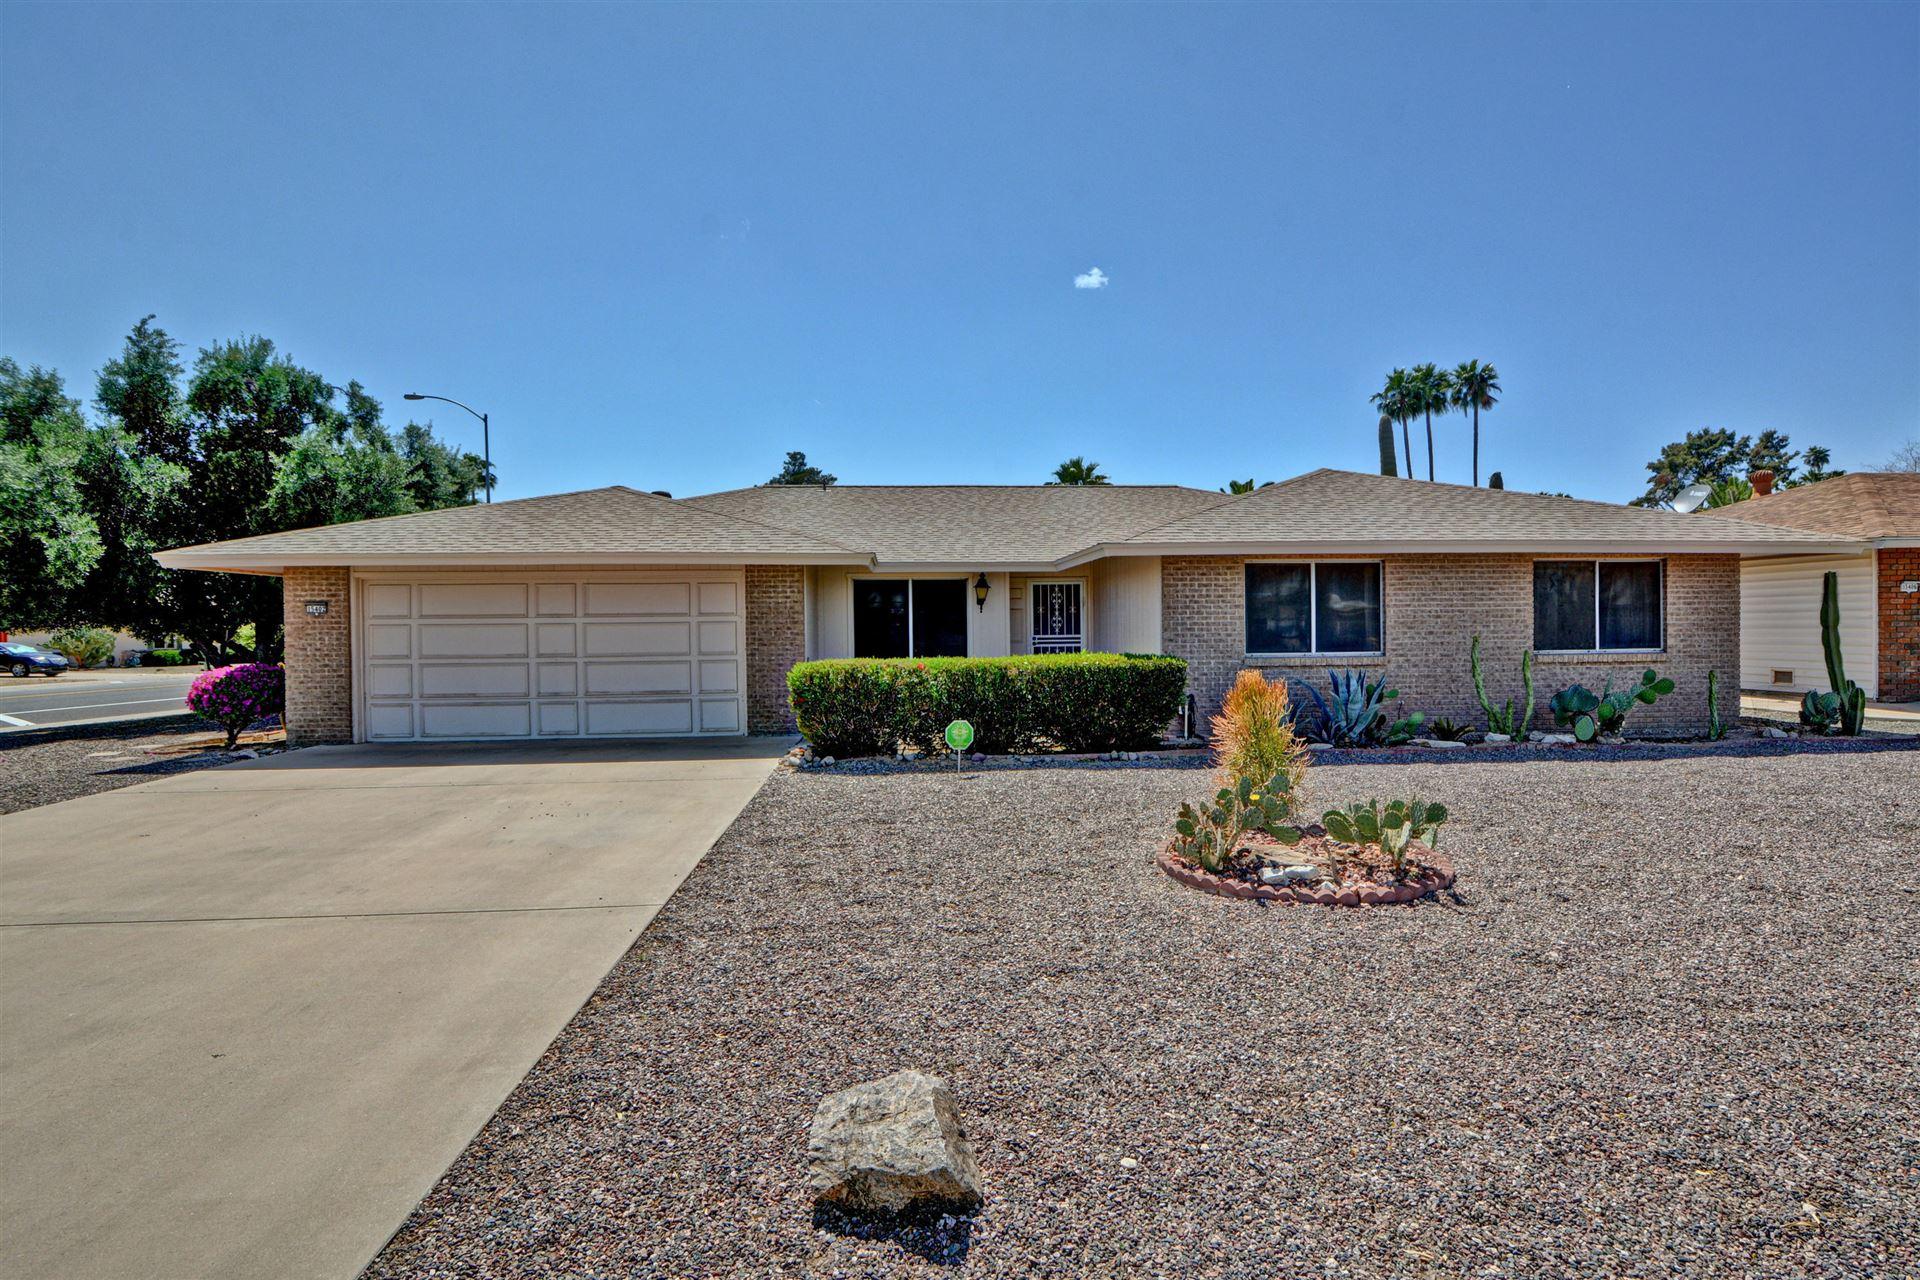 Photo of 15402 N BOWLING GREEN Drive, Sun City, AZ 85351 (MLS # 6228462)